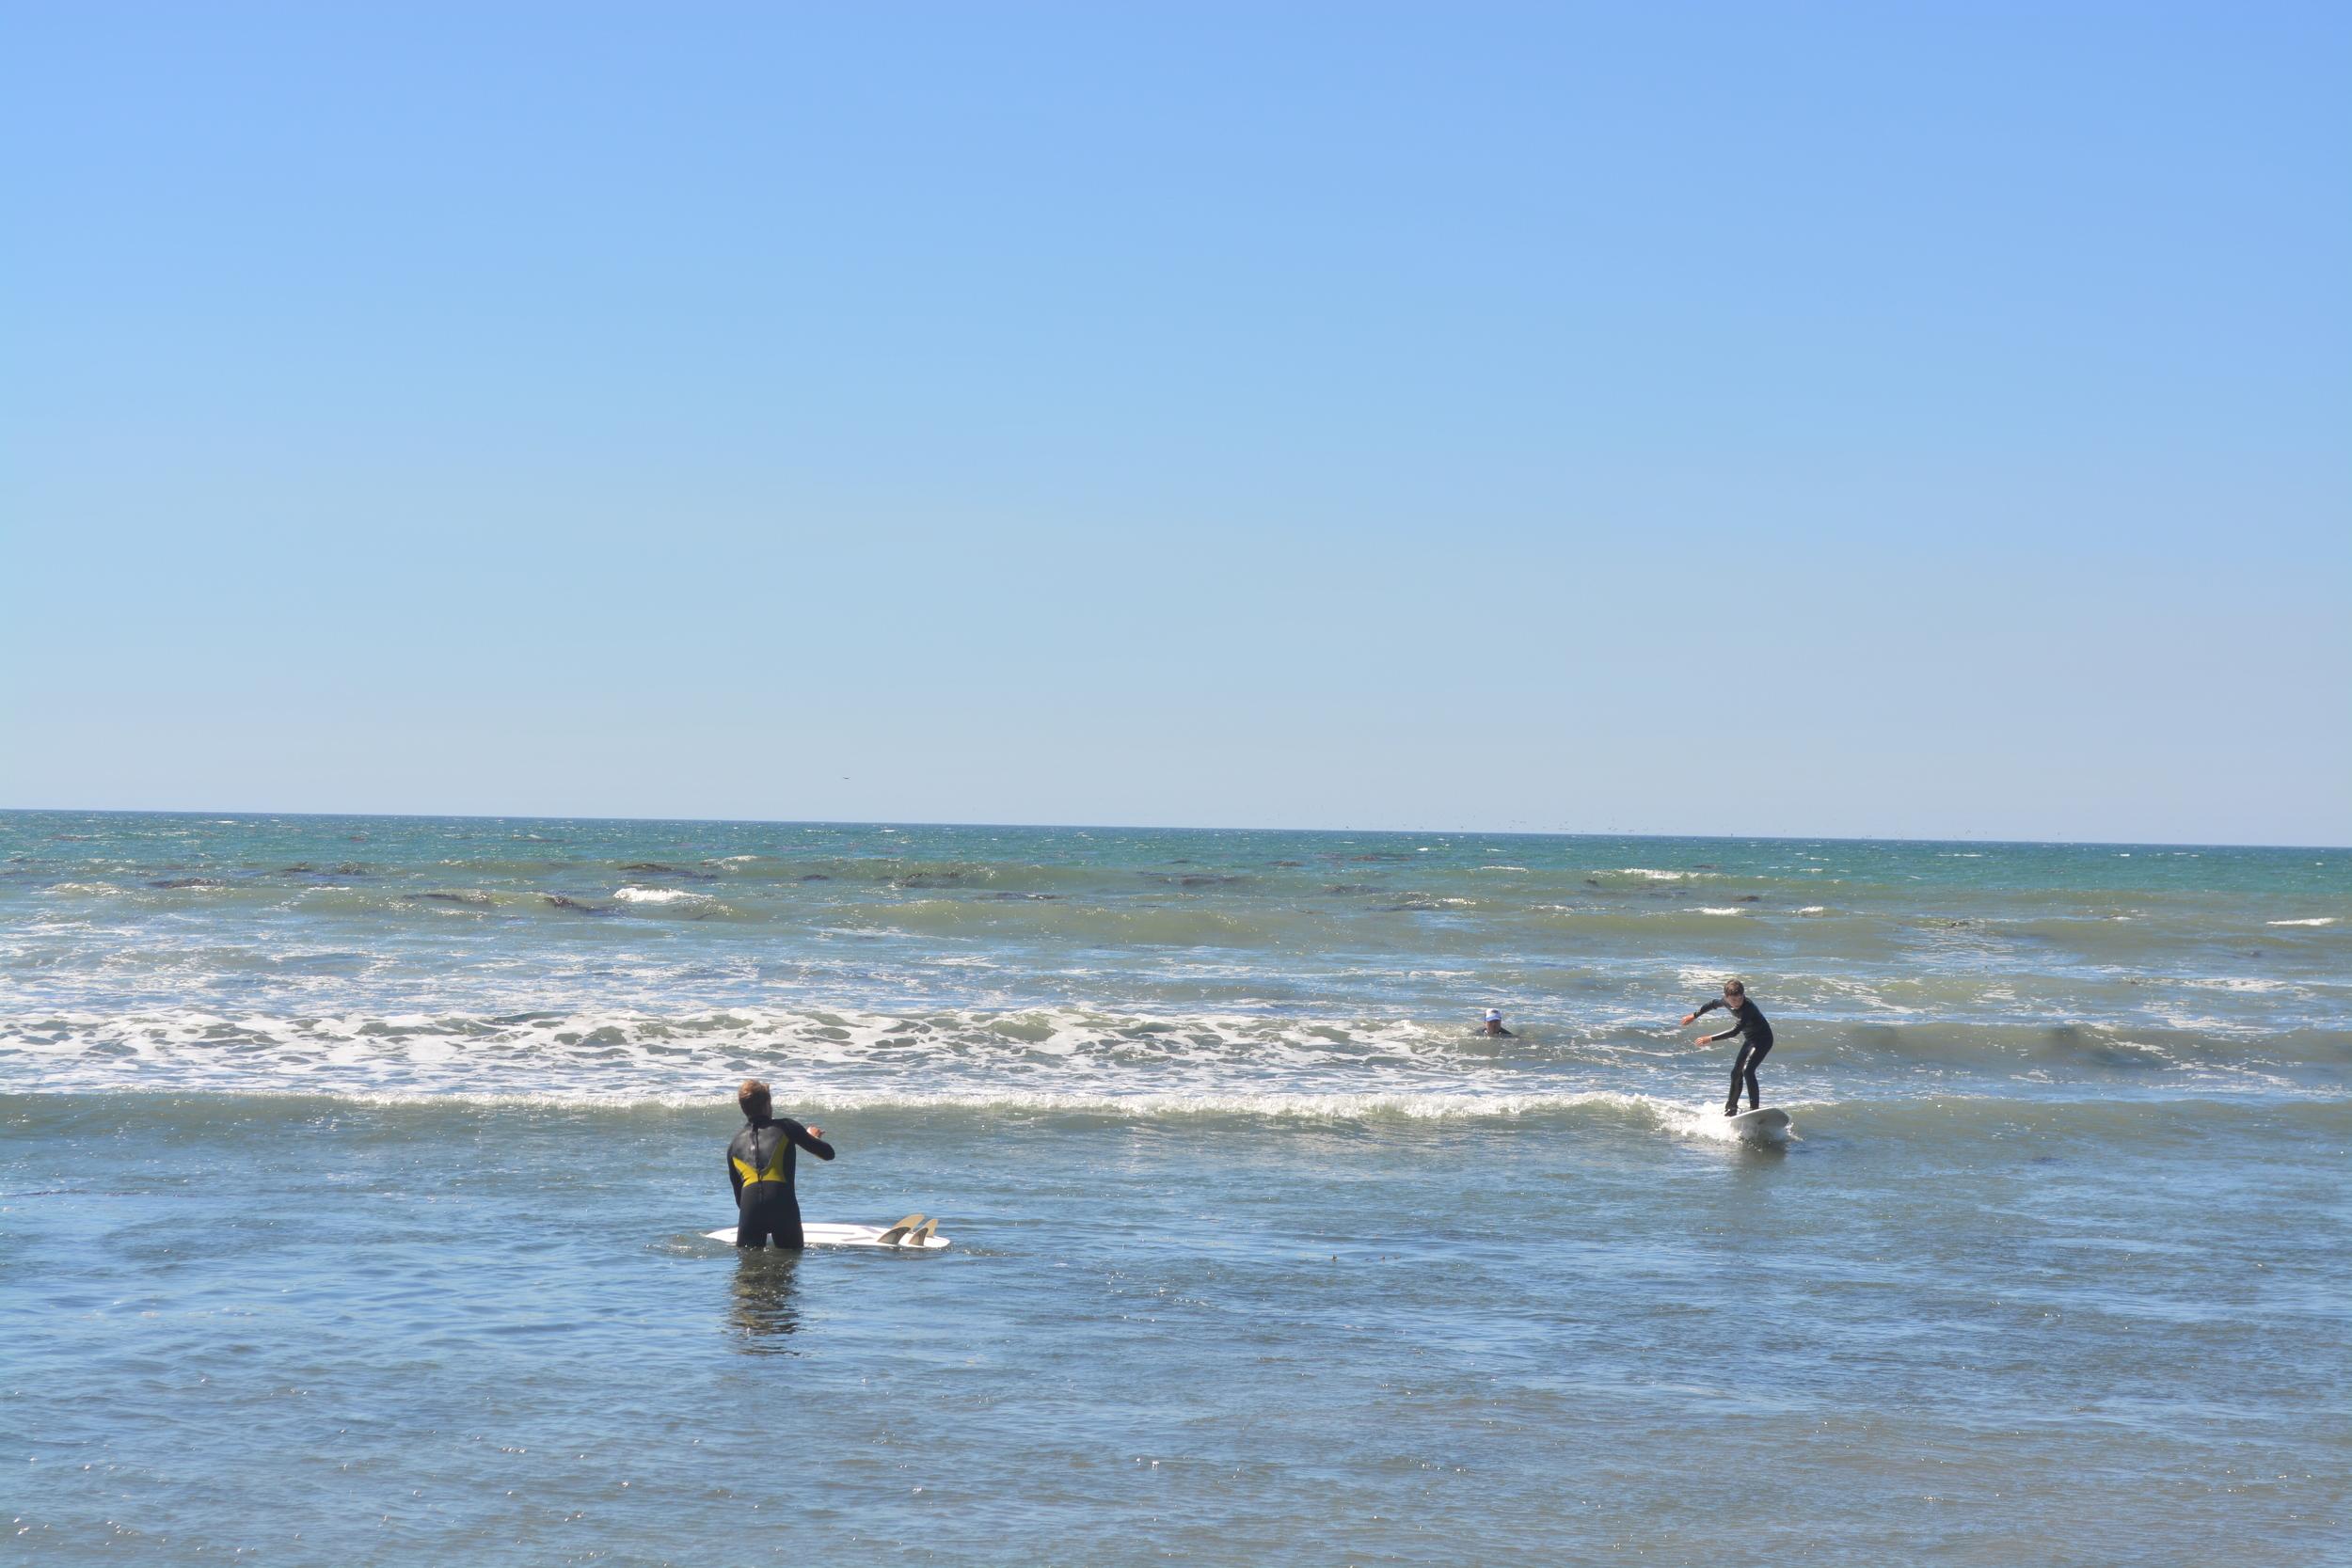 Baja California 10-5-13 Shipwrecks Surfing Adventure Ocean Experience Surf School San Diego (34).JPG